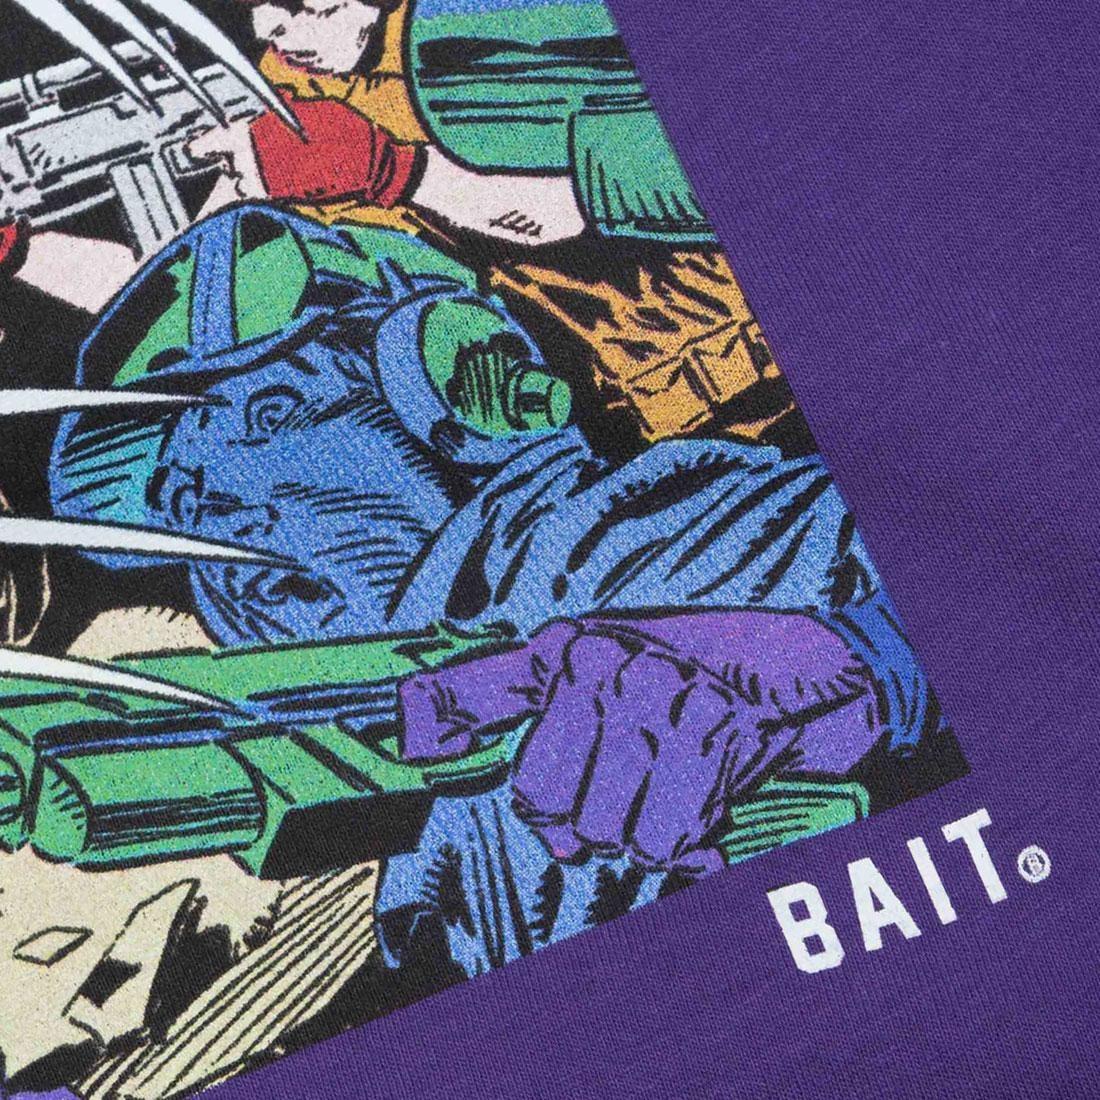 【SALE】BAIT MARVEL THE UNCANNY X-MEN TEE - 197-MRV-TEE-005